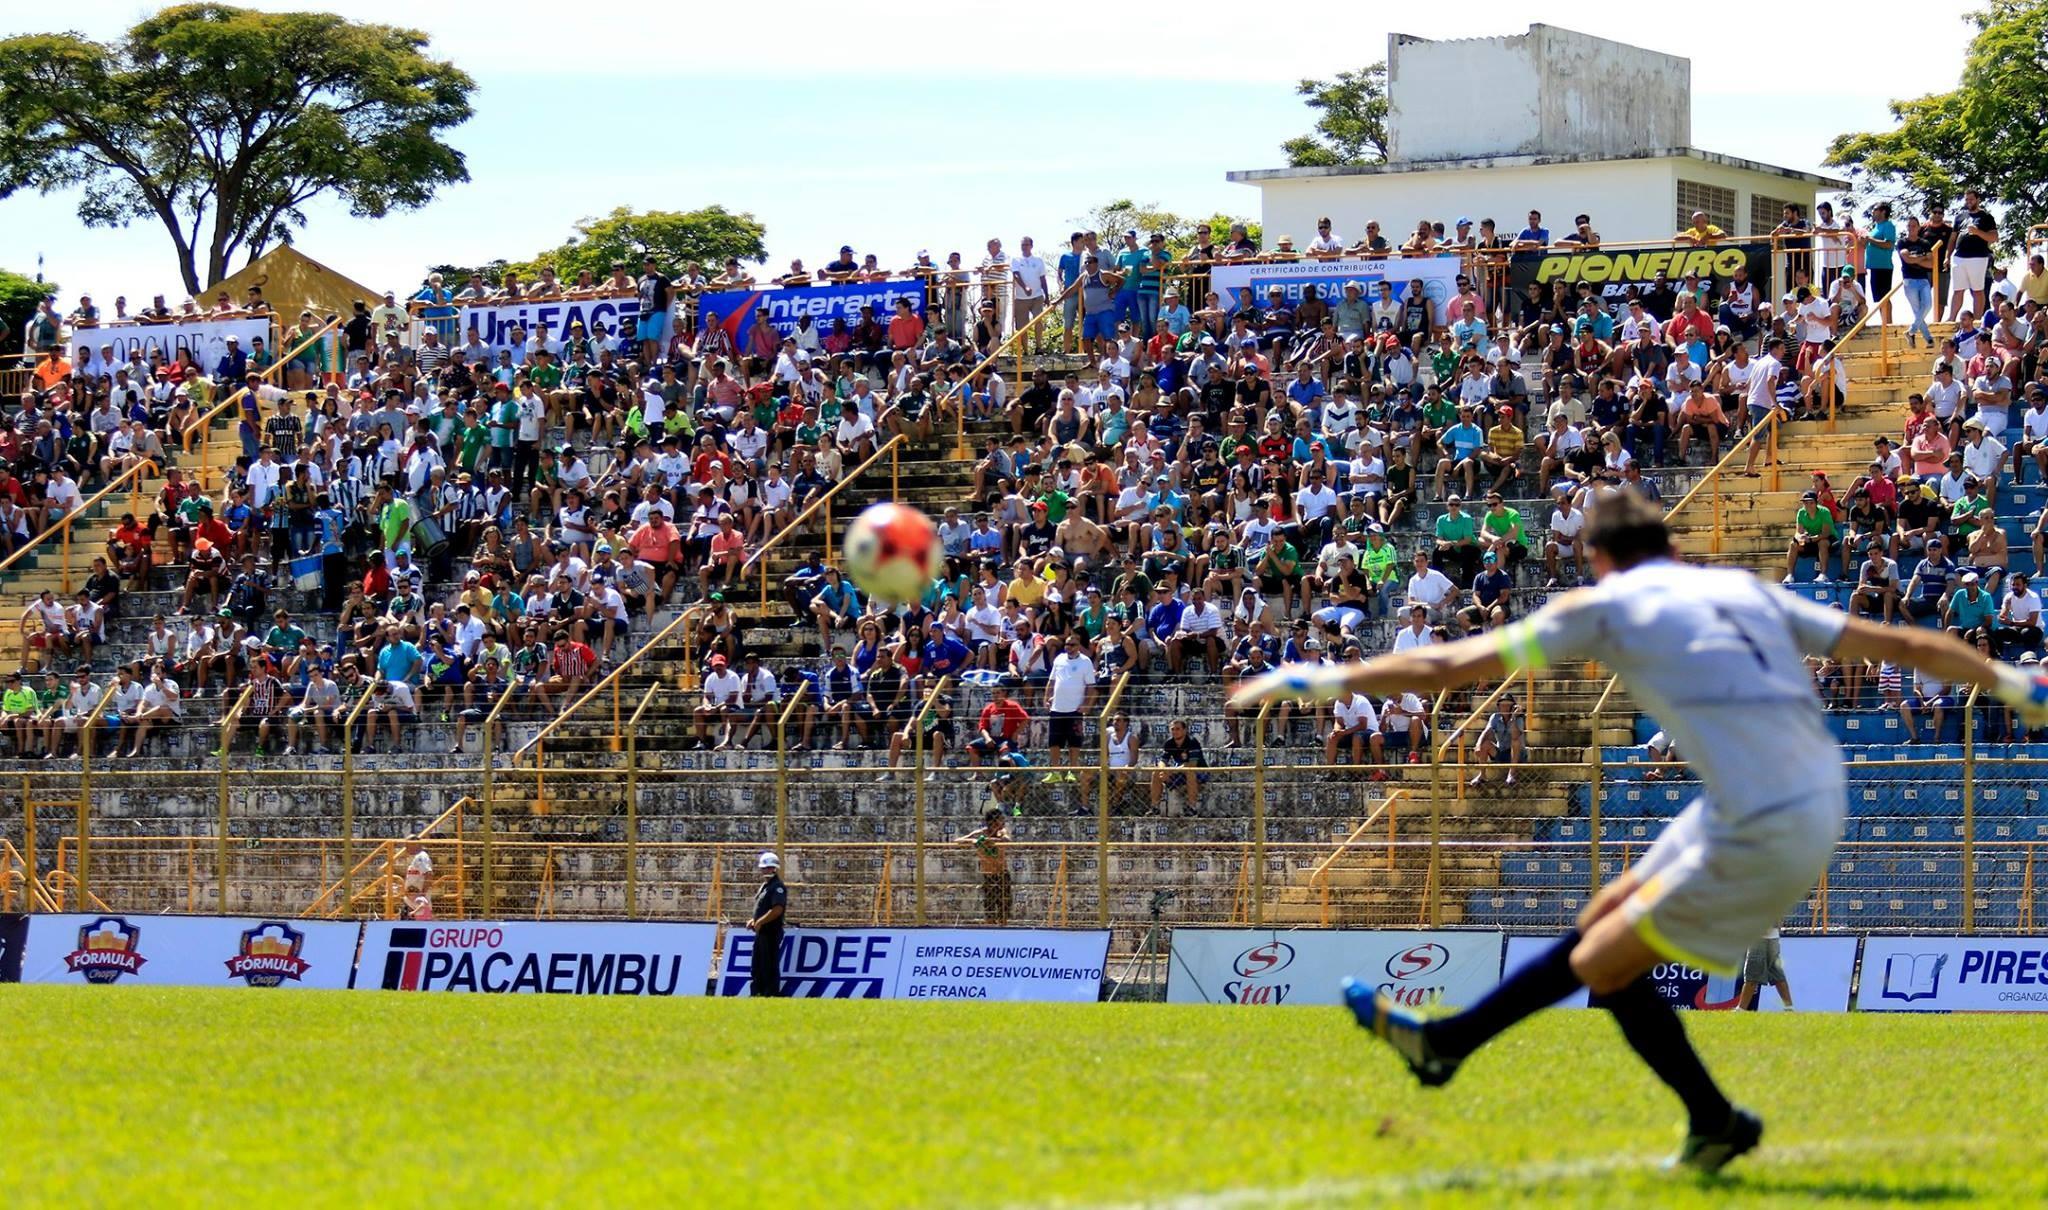 https   globoesporte.globo.com futebol times america-mg noticia ... aefd6700b6201